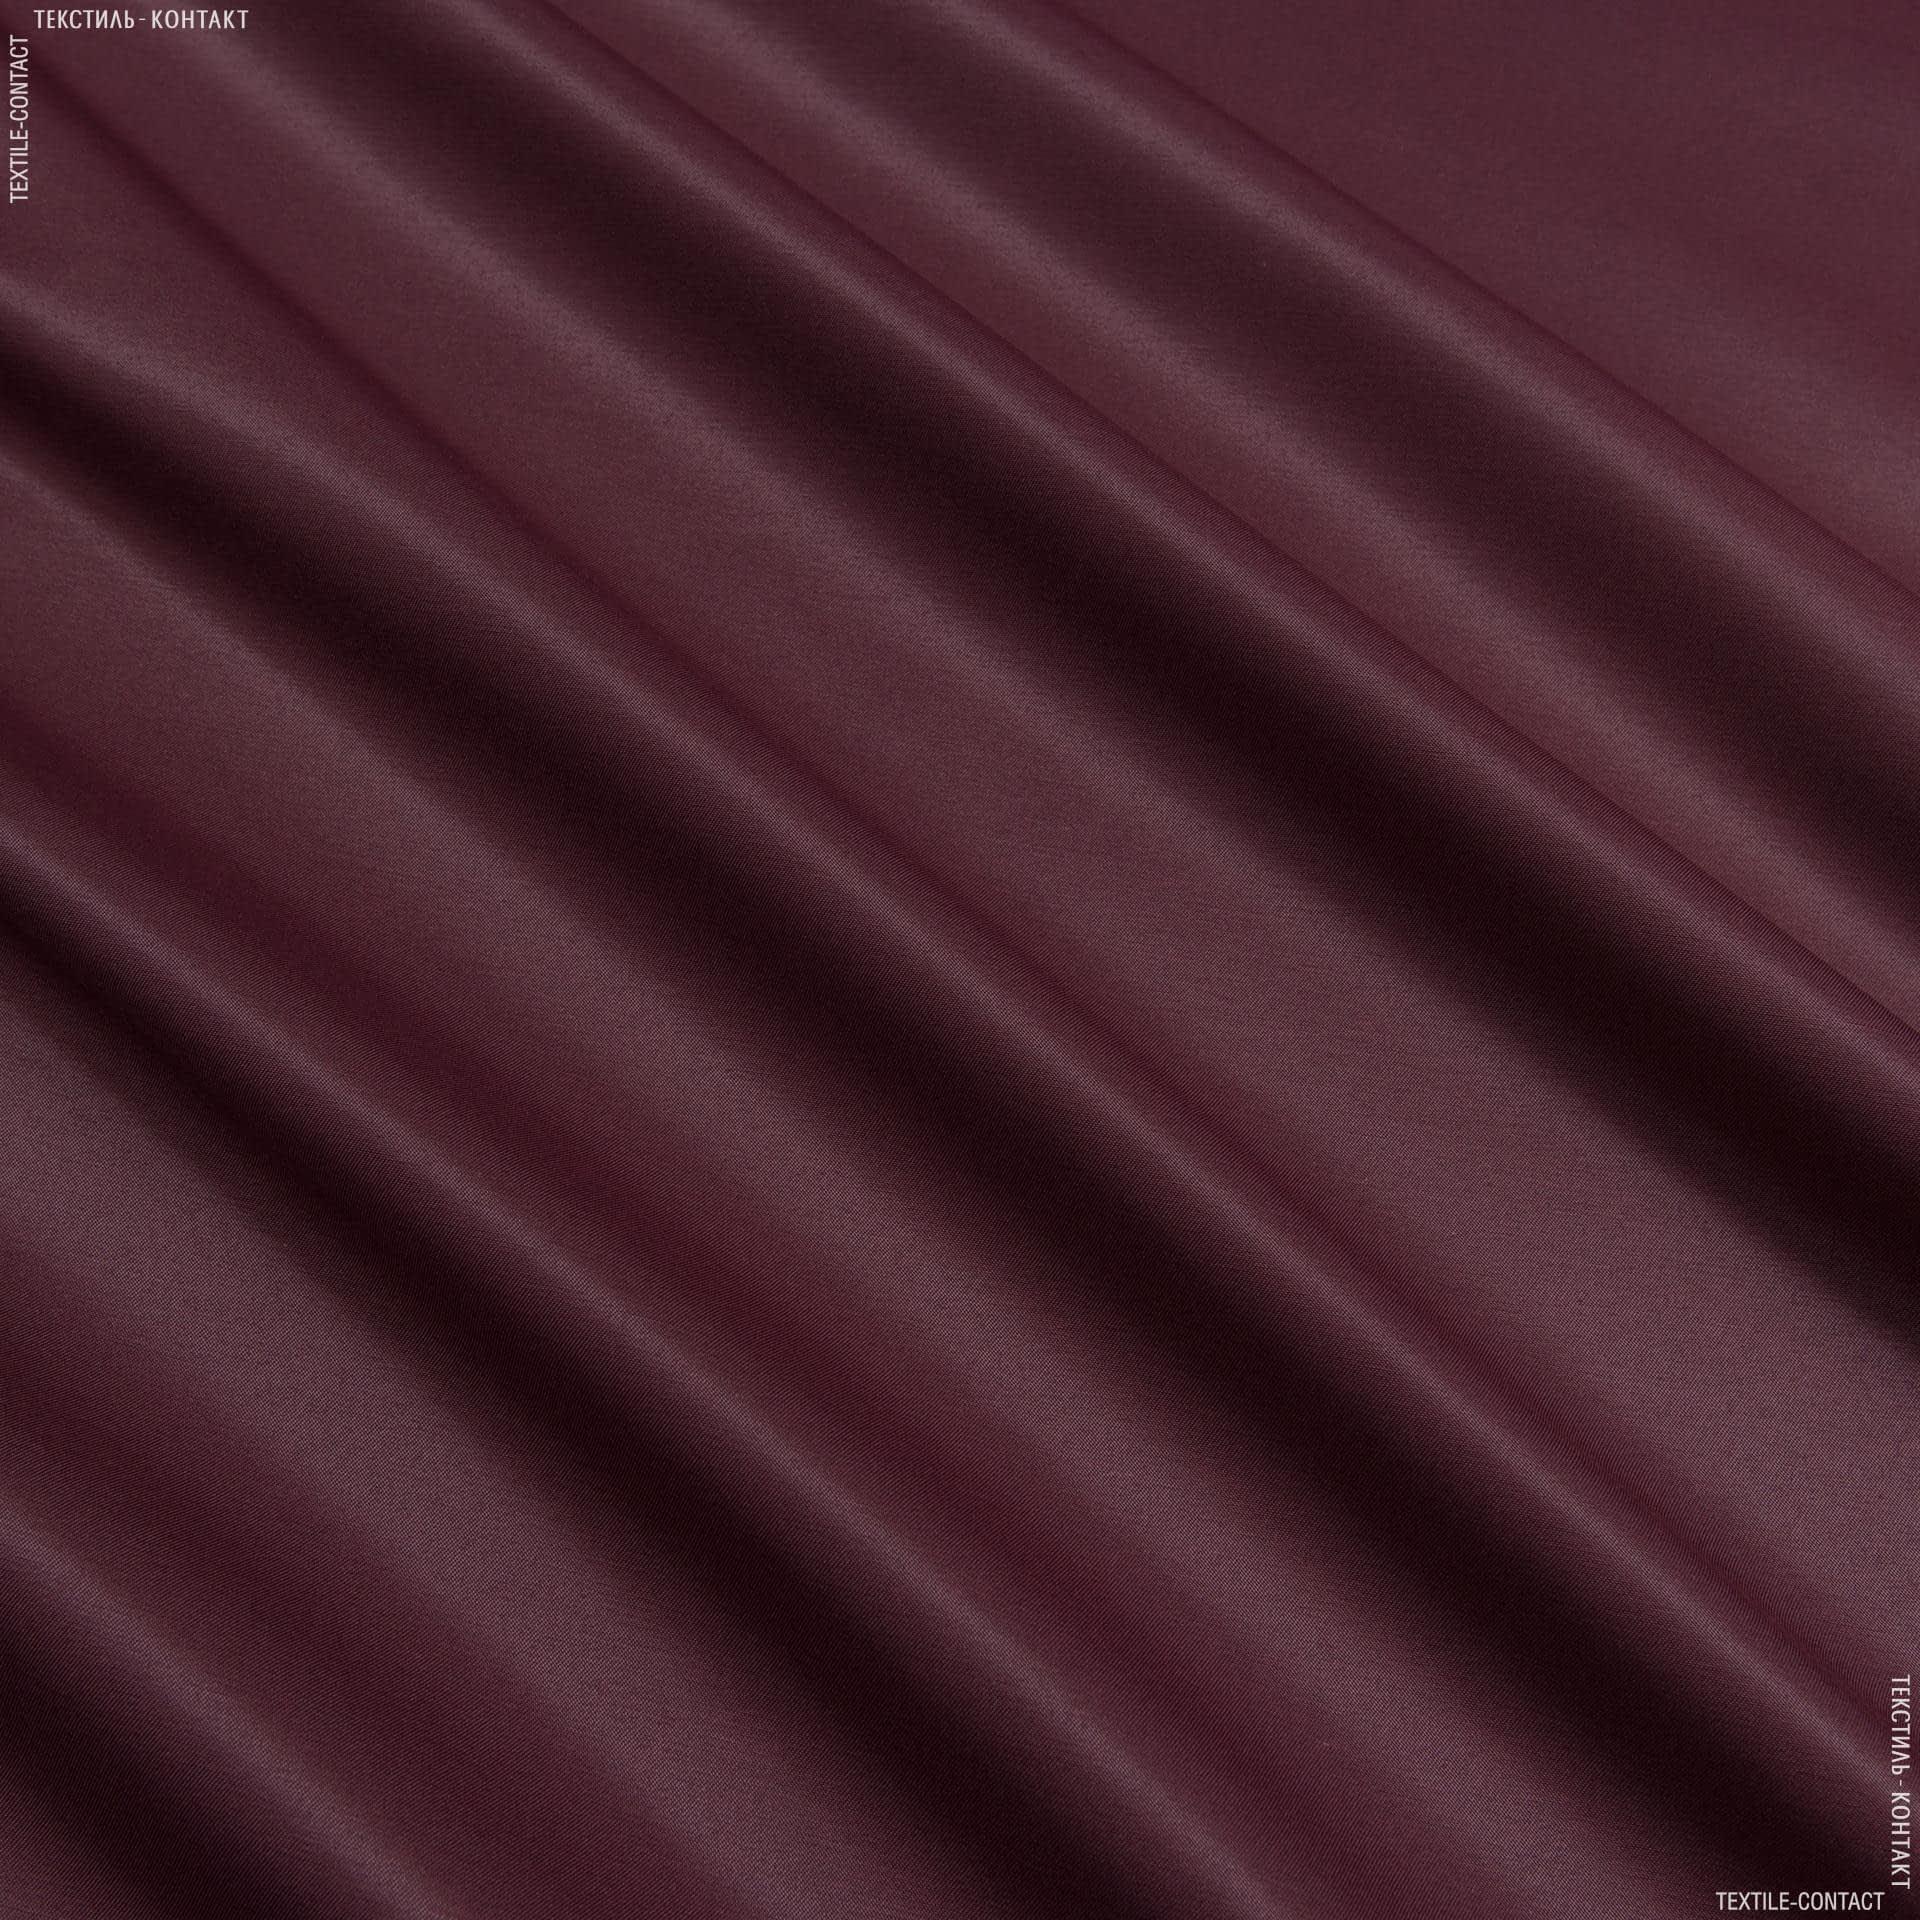 Ткани для спецодежды - Грета-2701 бордо